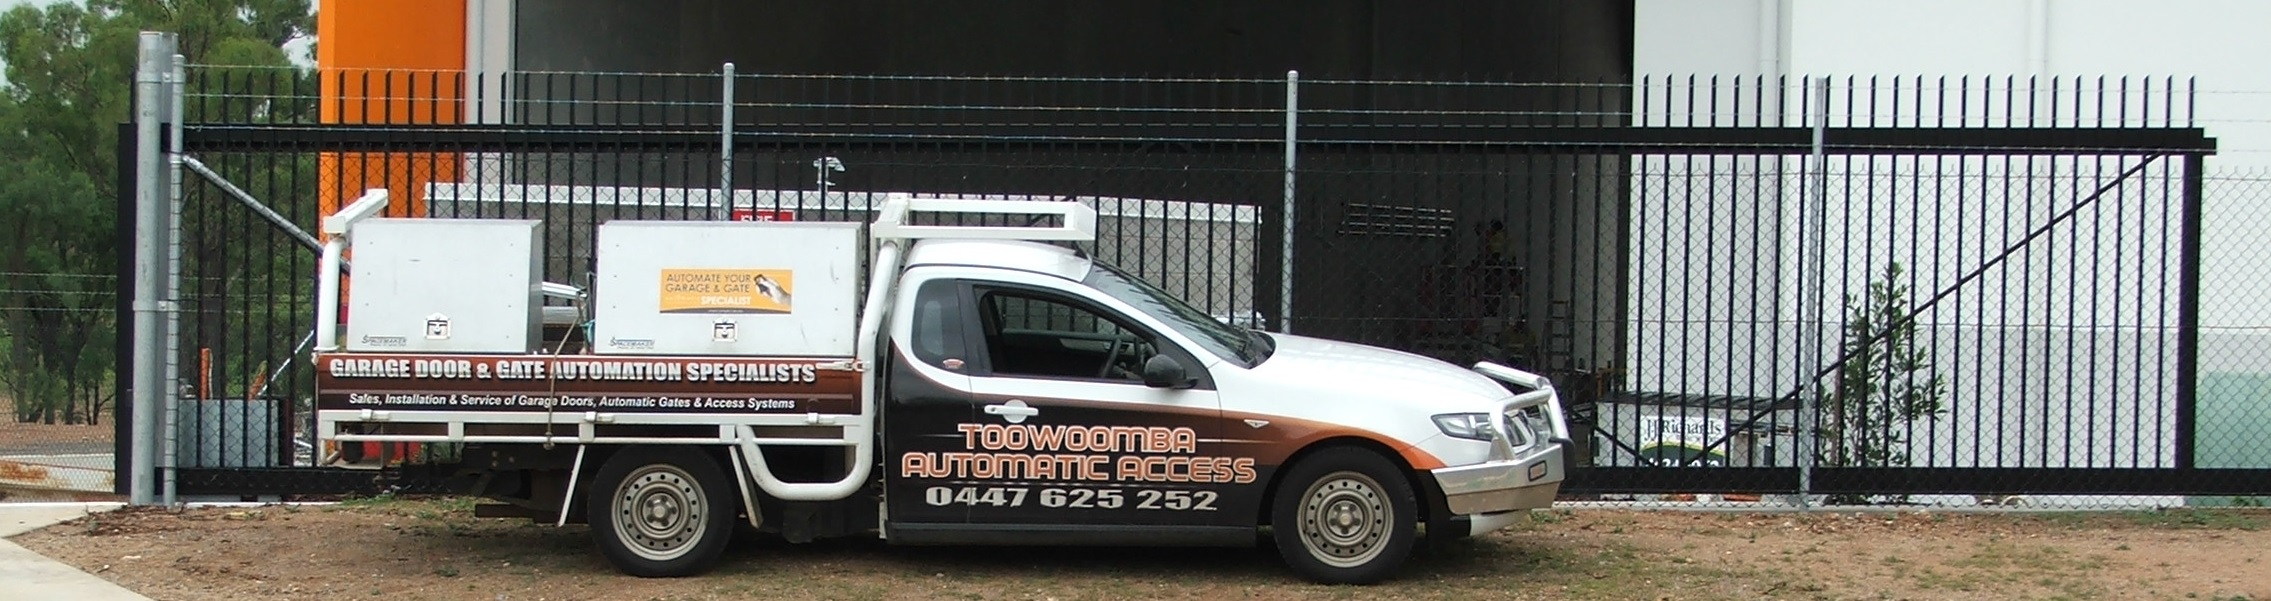 Toowoomba Automatic Access